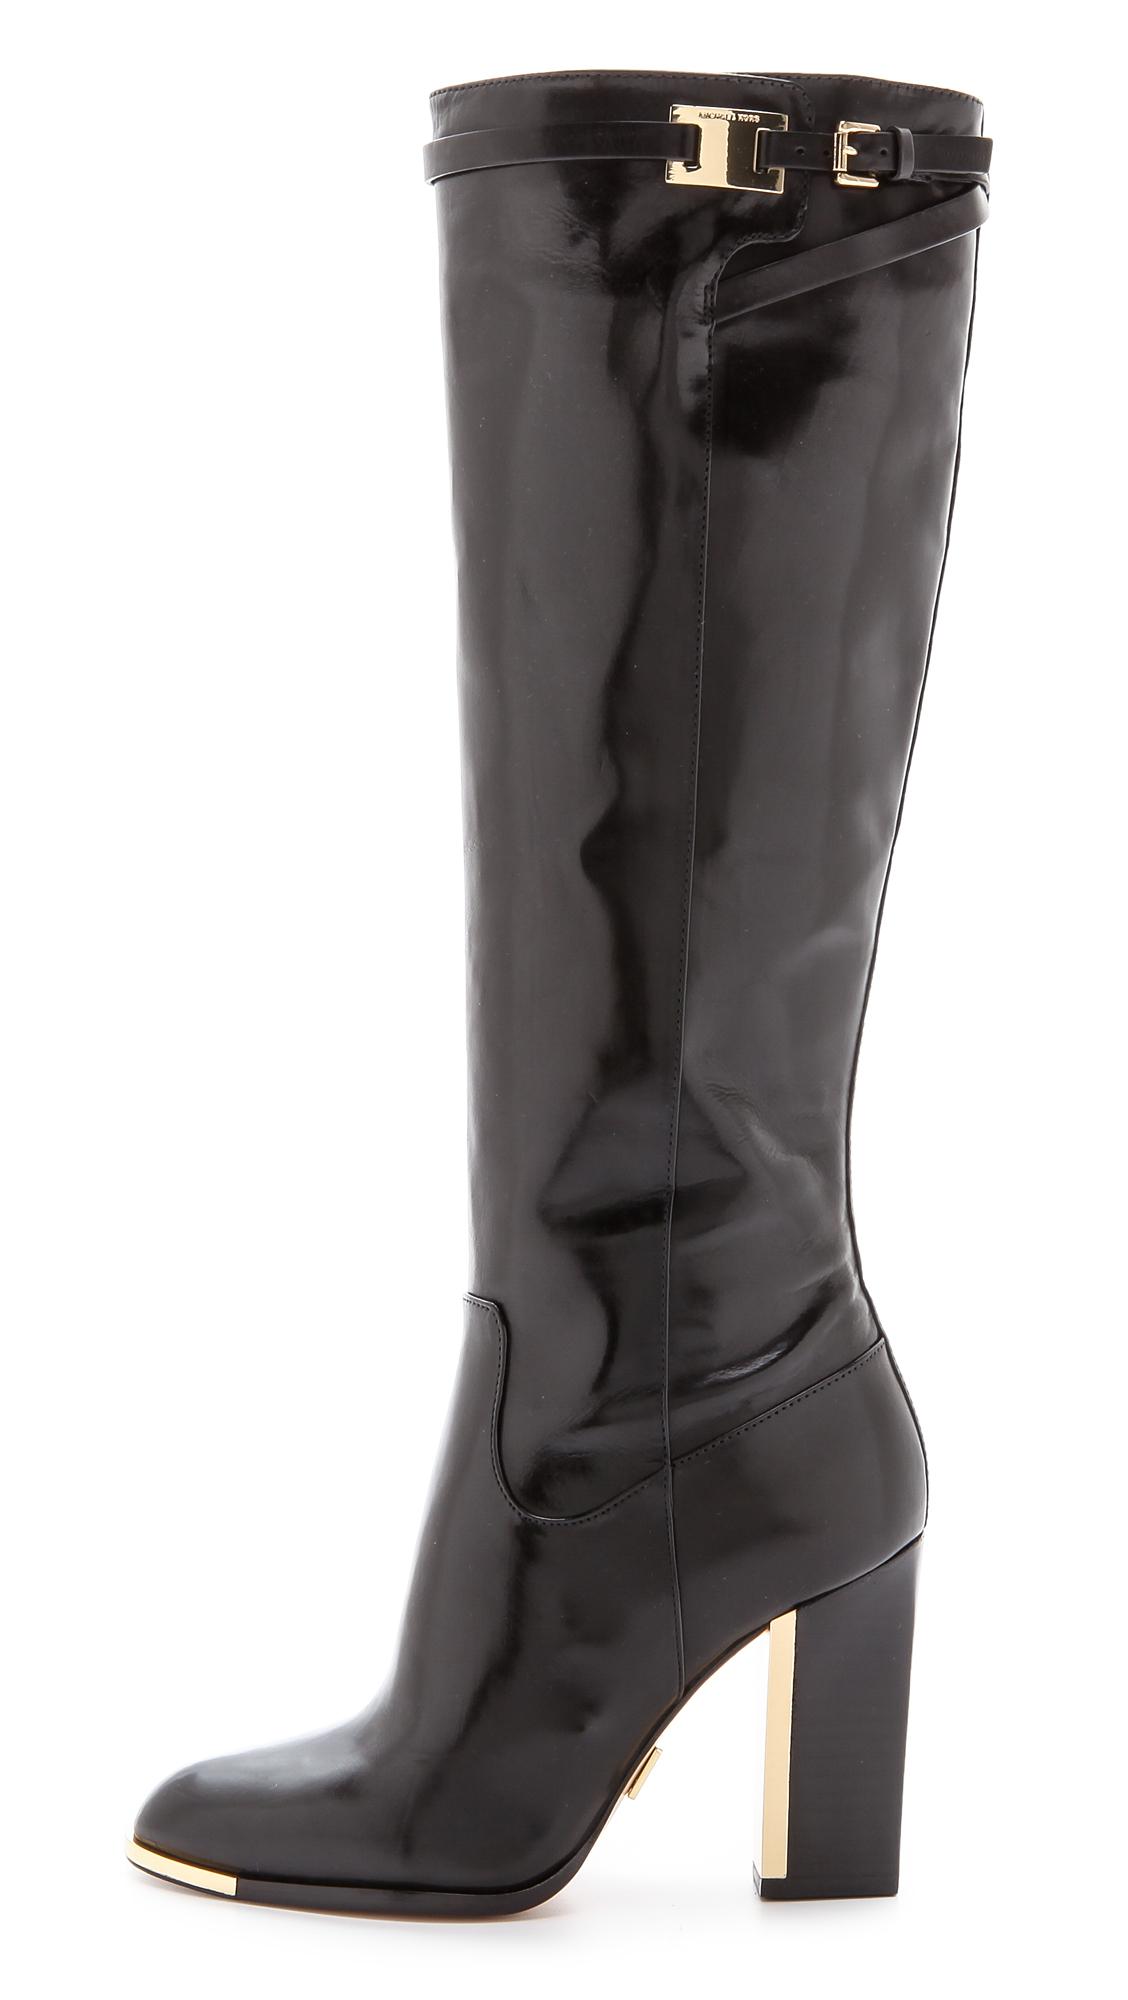 Michael Kors Julie Tall Boots Black In Black Lyst